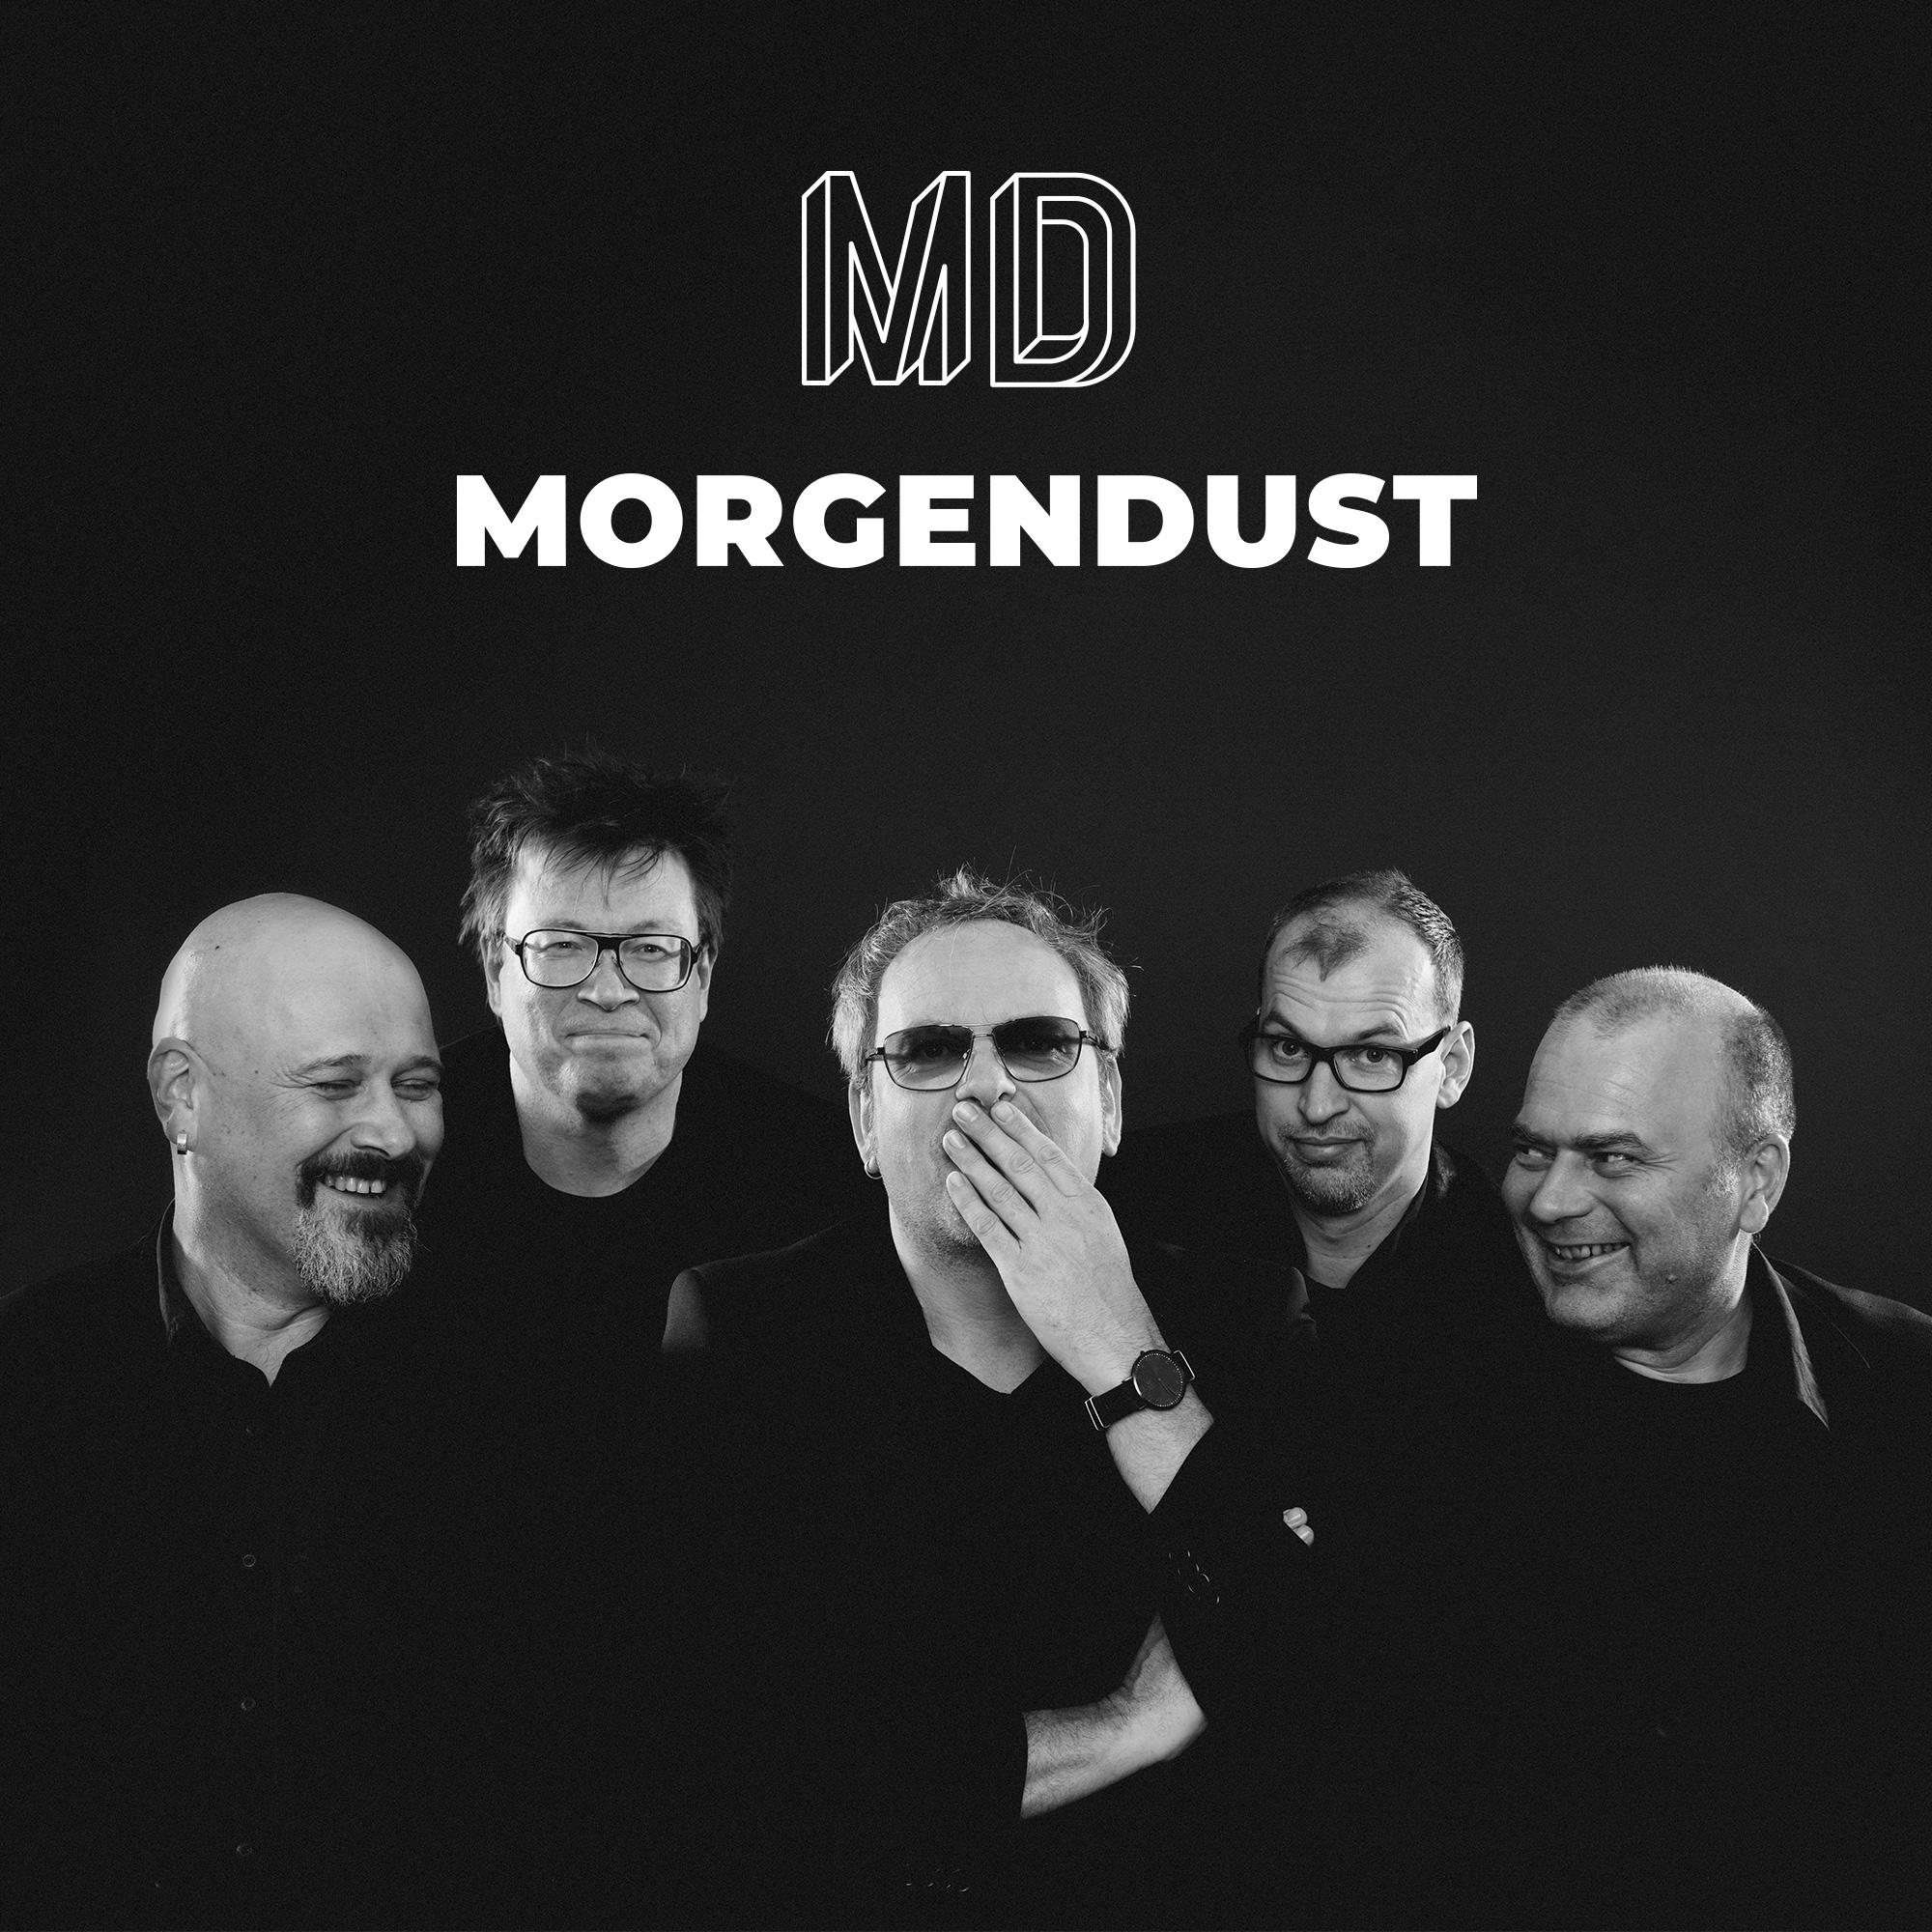 Morgendust square 2000x2000